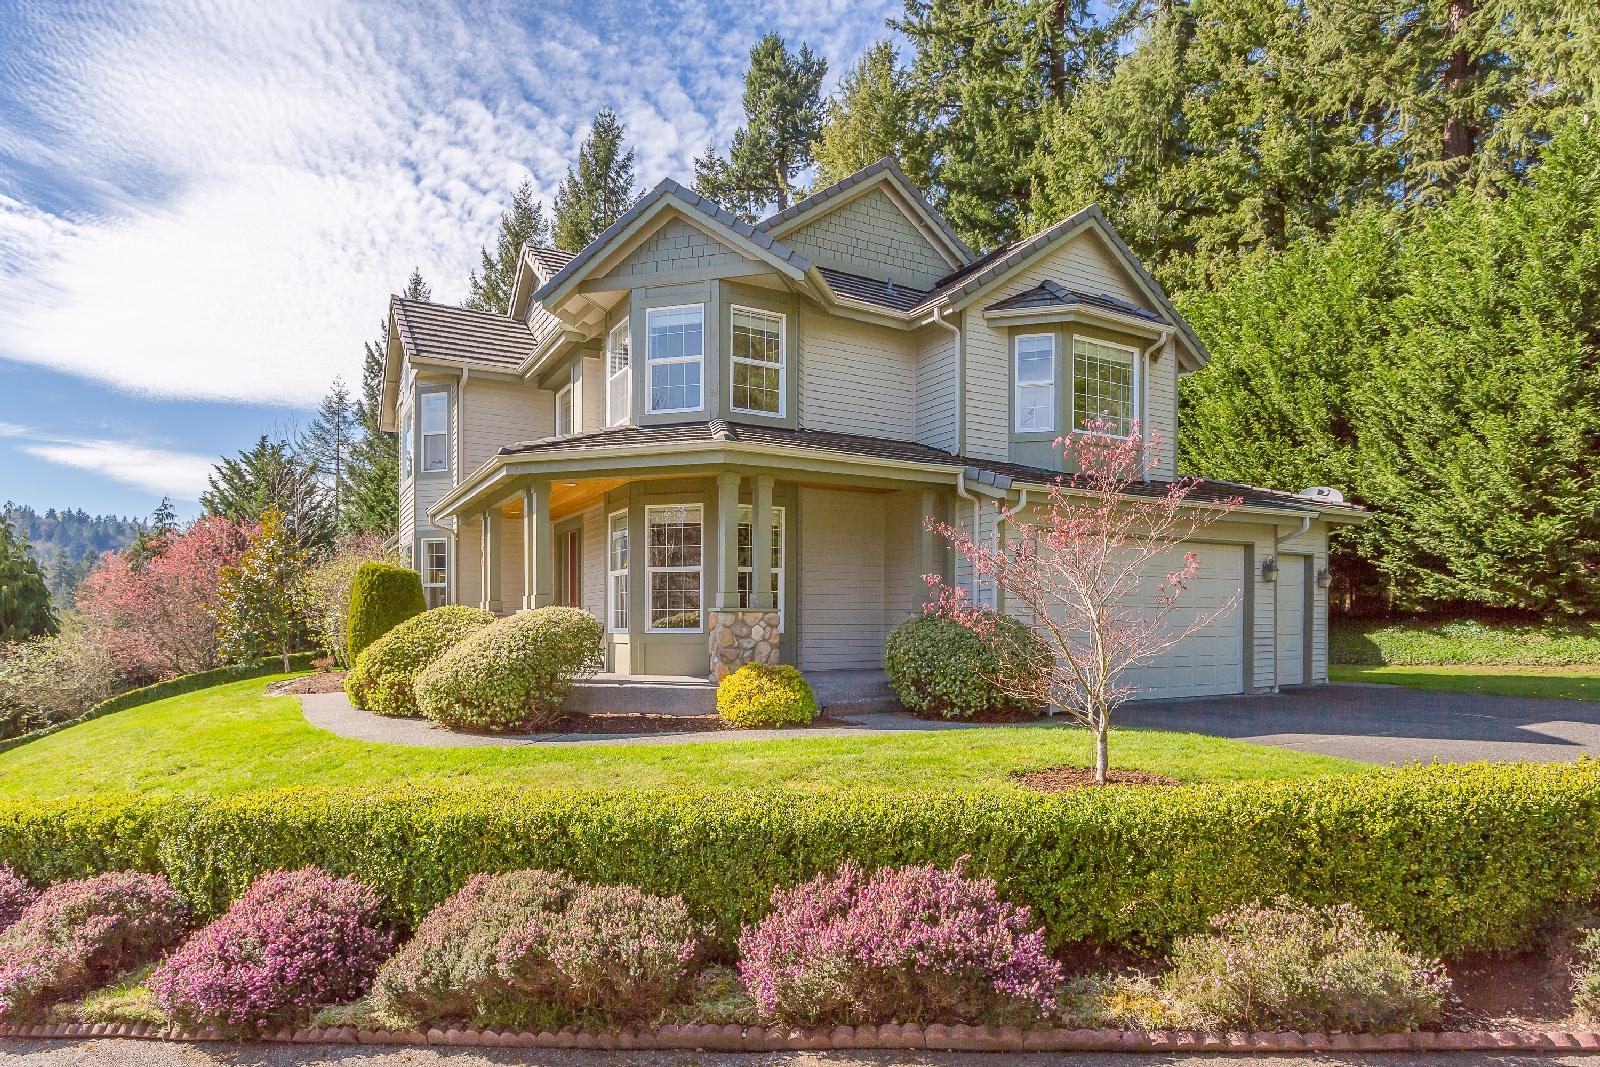 Single Family Home for Sale at 3918 225th Ct NE Redmond, Washington 98053 United States